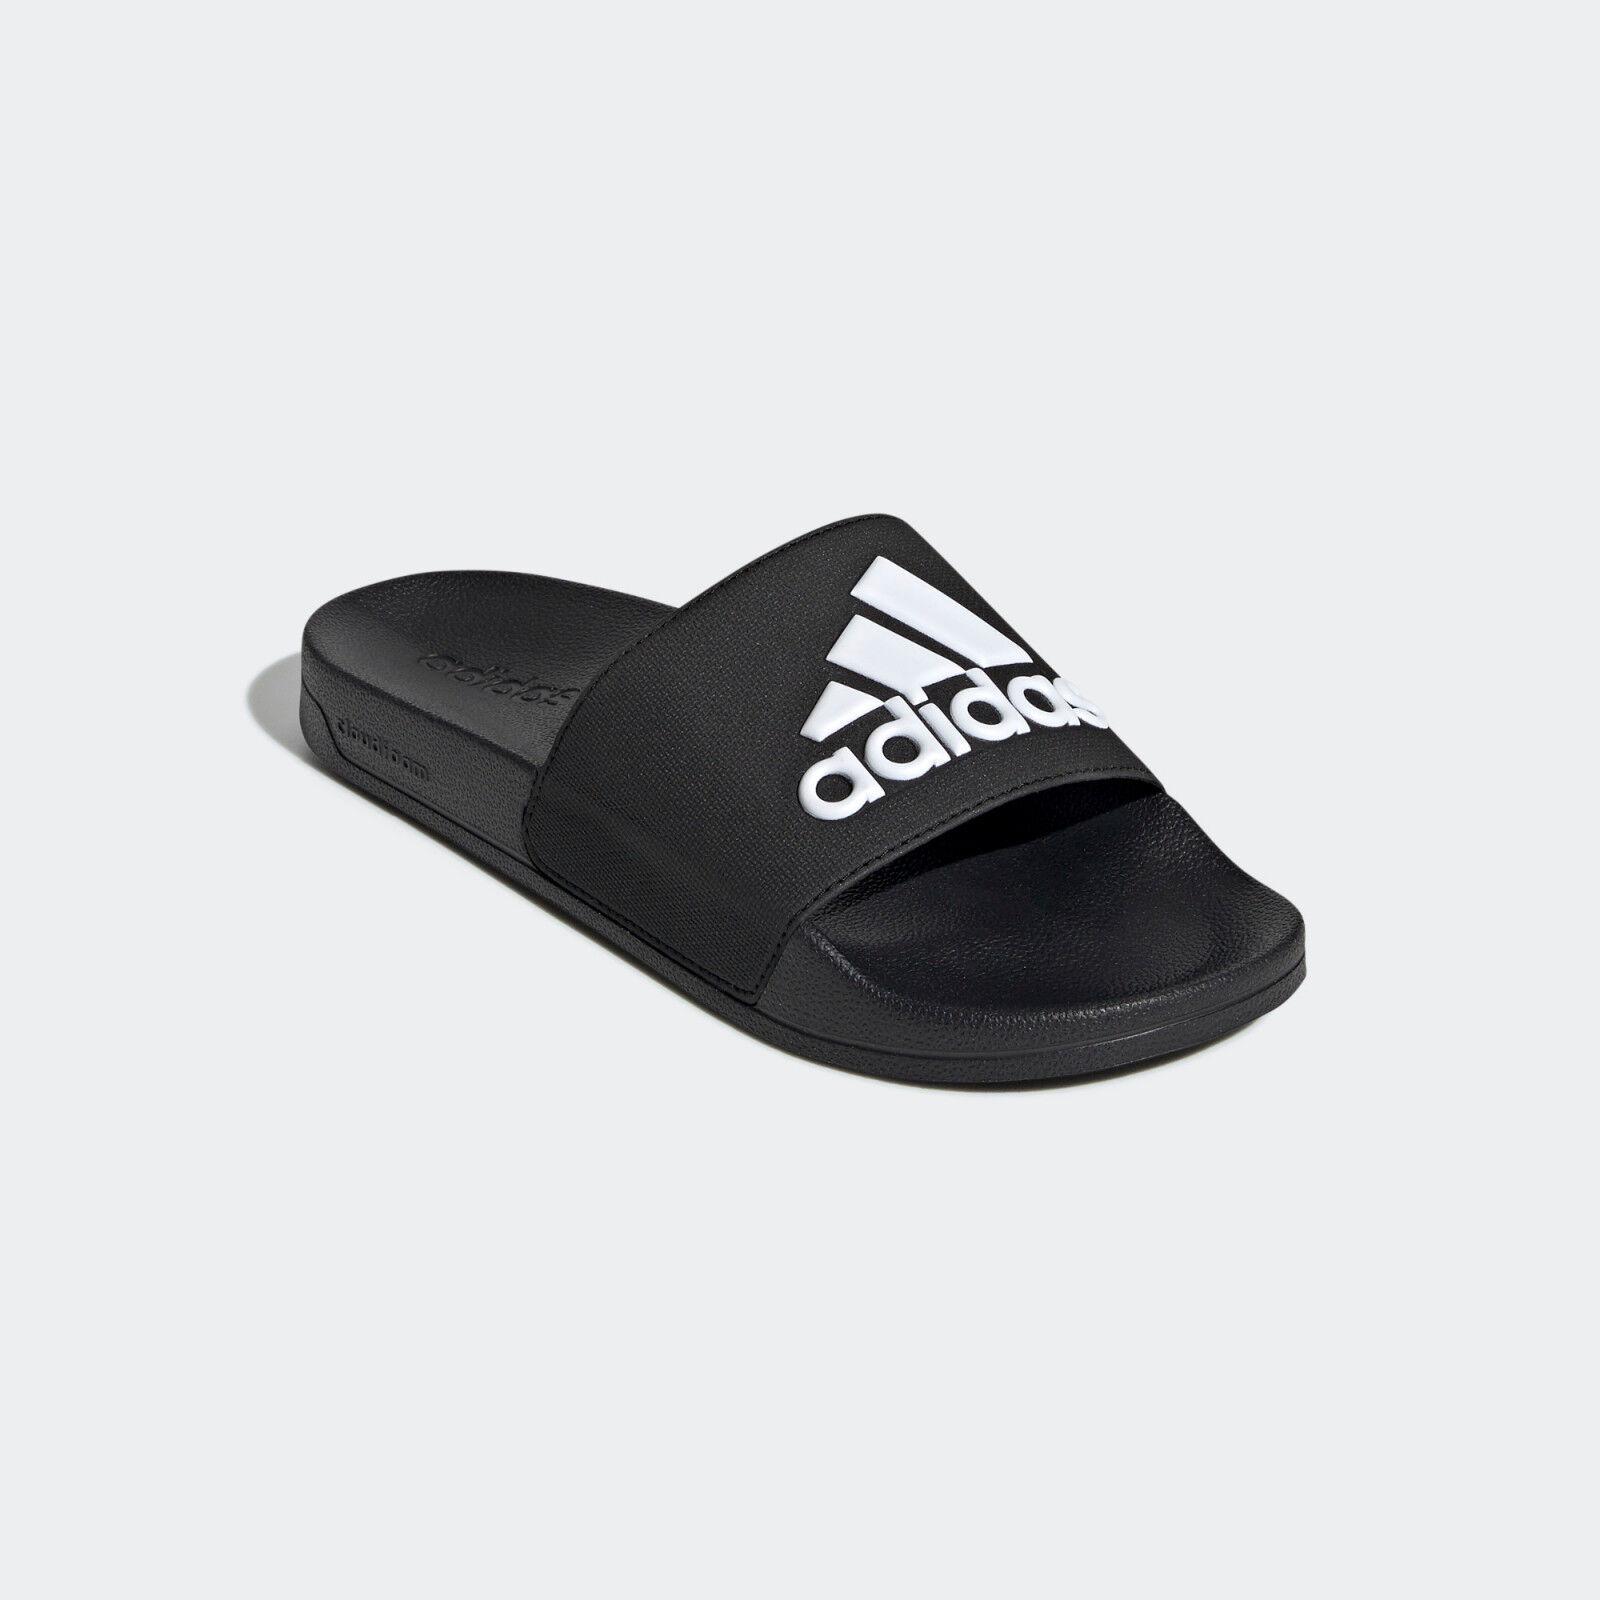 f99b6884140 Mens Adidas Adilette Black Slides Shower Sandal Athletic Sport F34770 Sizes  8-13